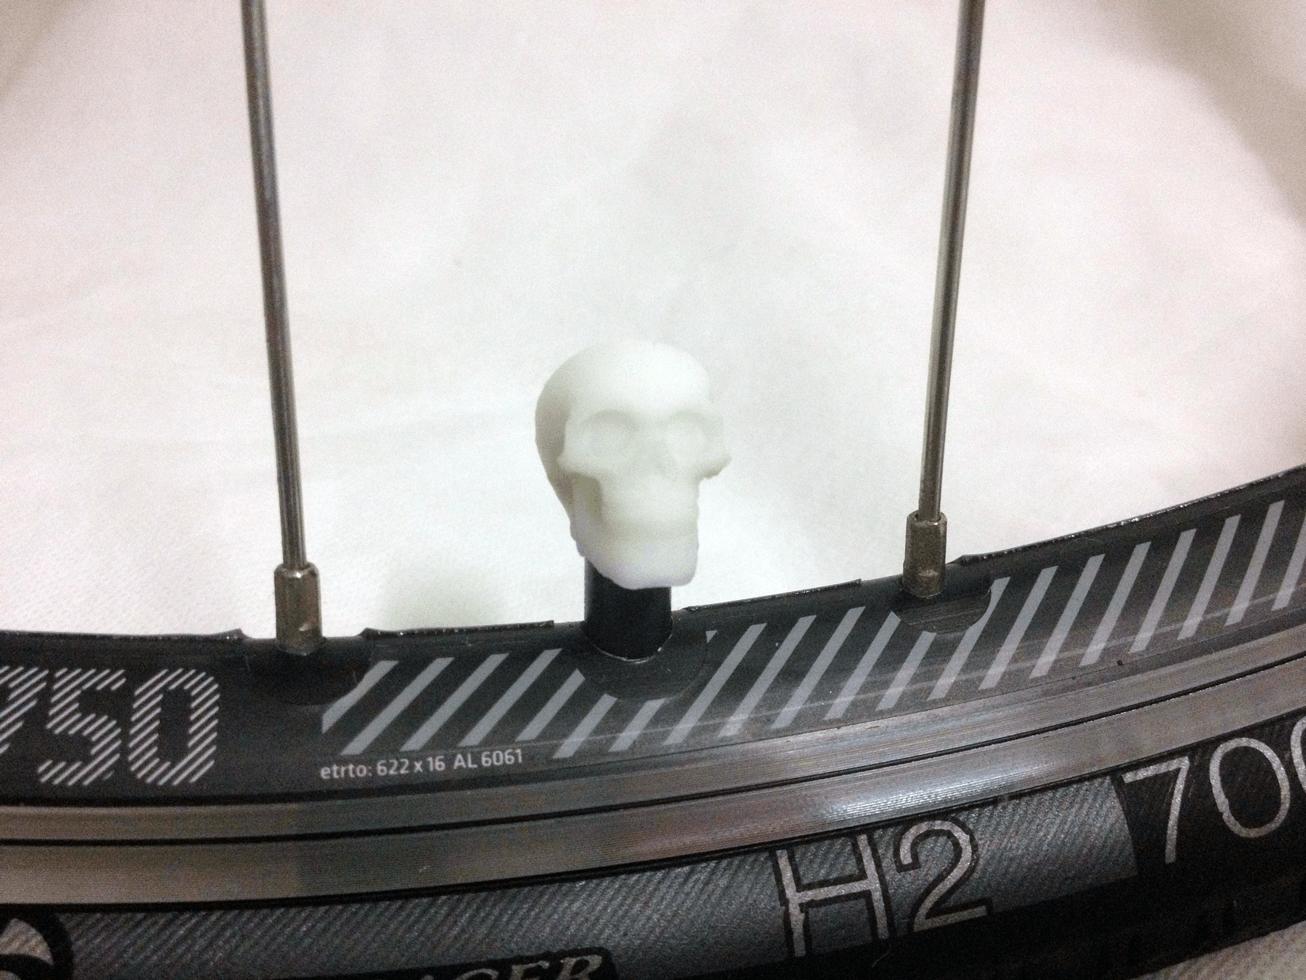 bike-skull-white.png Download STL file Skull Head Car Truck Bike Van Tire Tyre Wheel Valve Stem Caps Cover • Template to 3D print, Custom3DPrinting